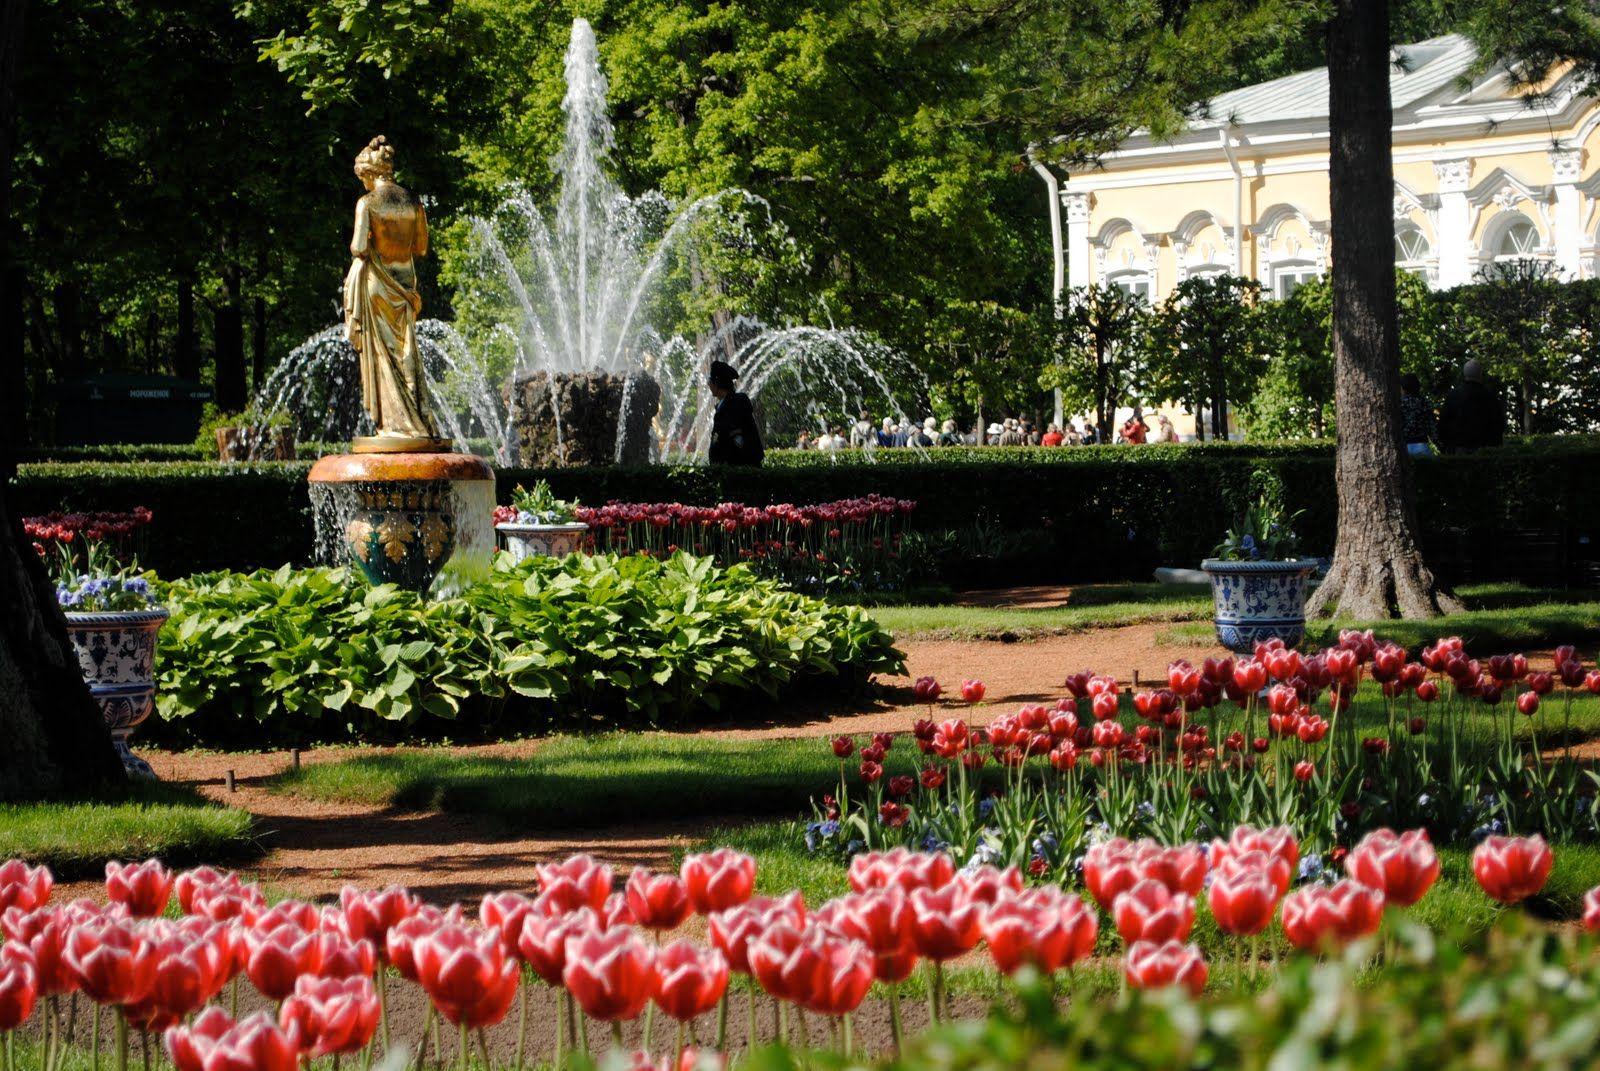 french gardens - Google Search | Inspiring Gardens | Pinterest ...